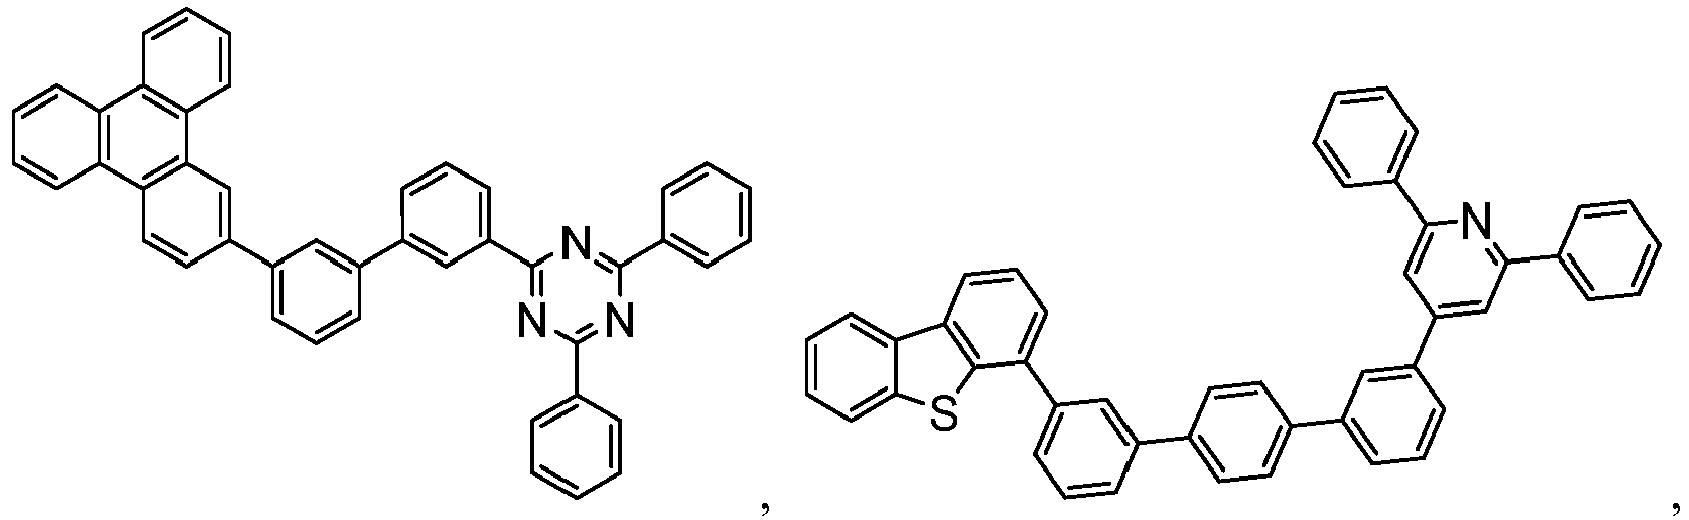 Figure imgb0903